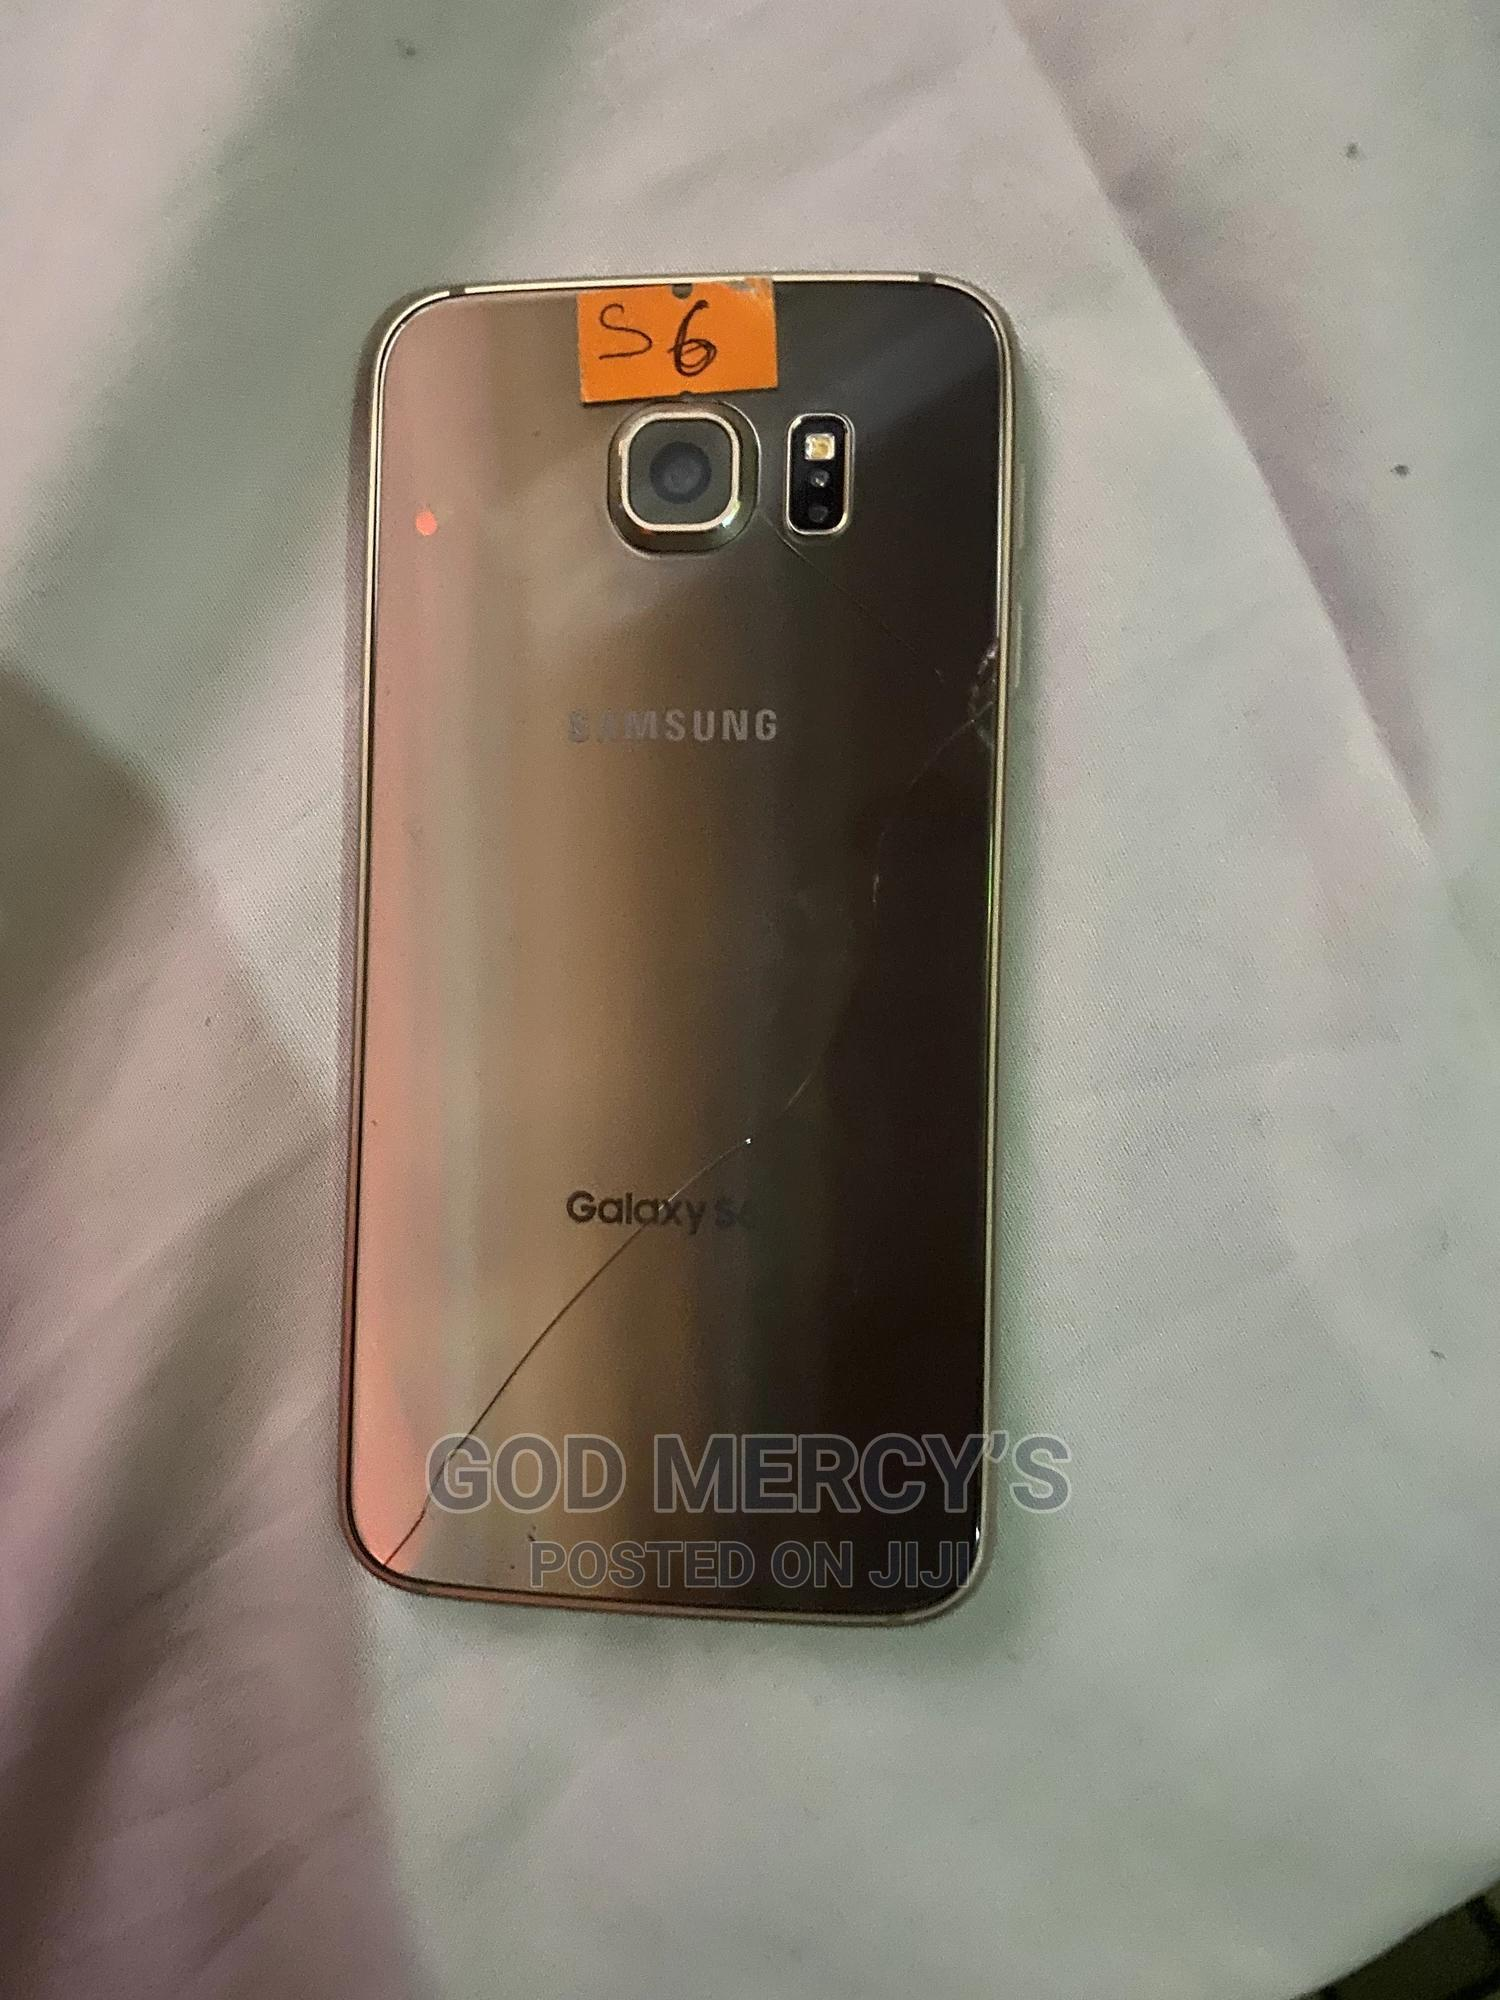 Samsung Galaxy S6 Plus 32 GB Gold